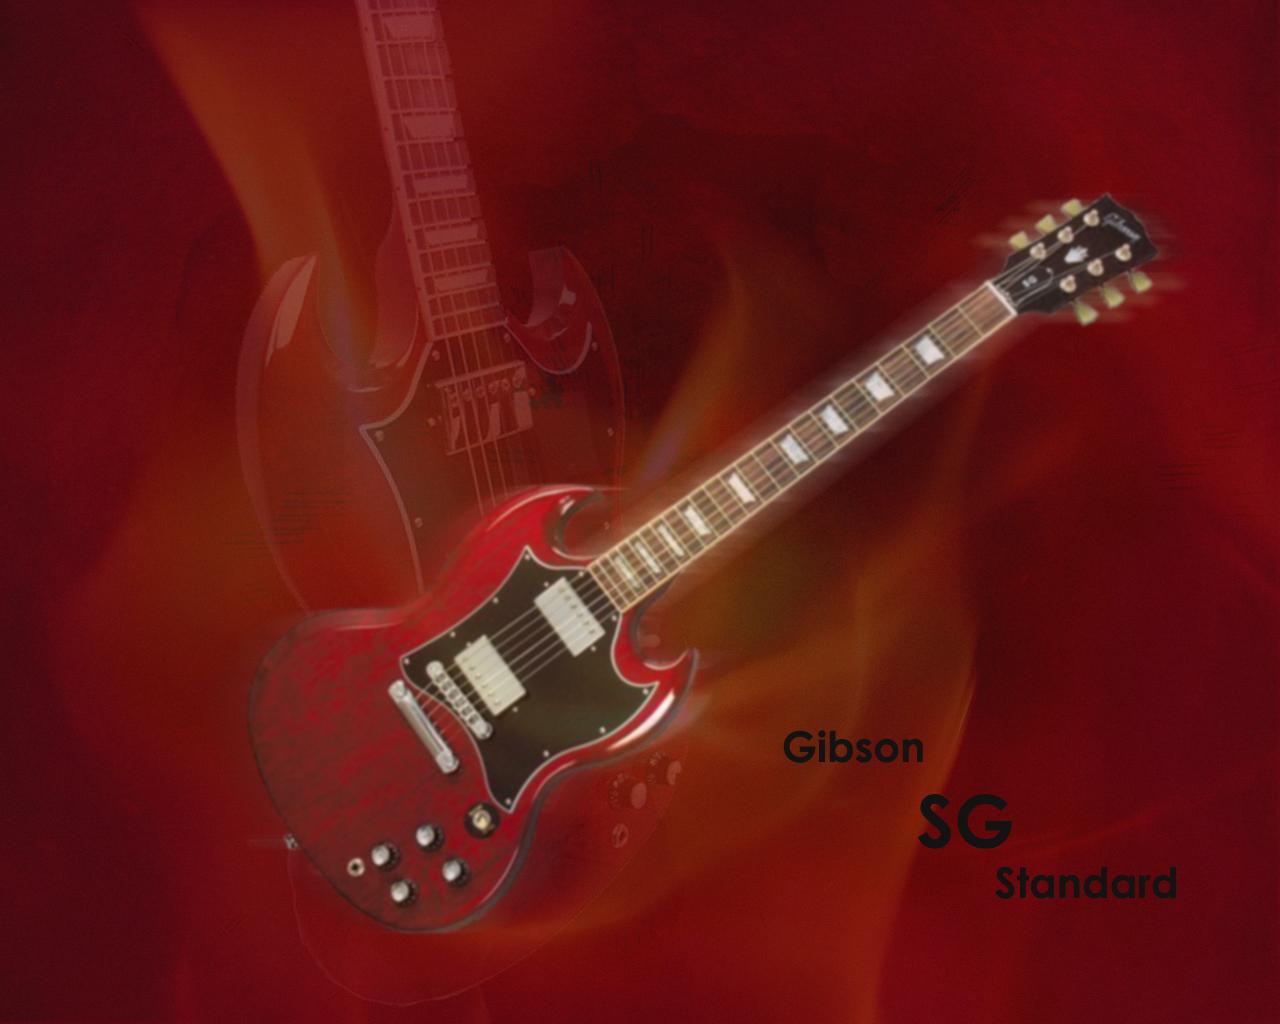 http://2.bp.blogspot.com/_mZ4UY-4nDiQ/TQgg6dzFYuI/AAAAAAAAAEE/PvoiSajvNtI/s1600/Gibson_SG_wallpaper_by_3_Dots.jpg